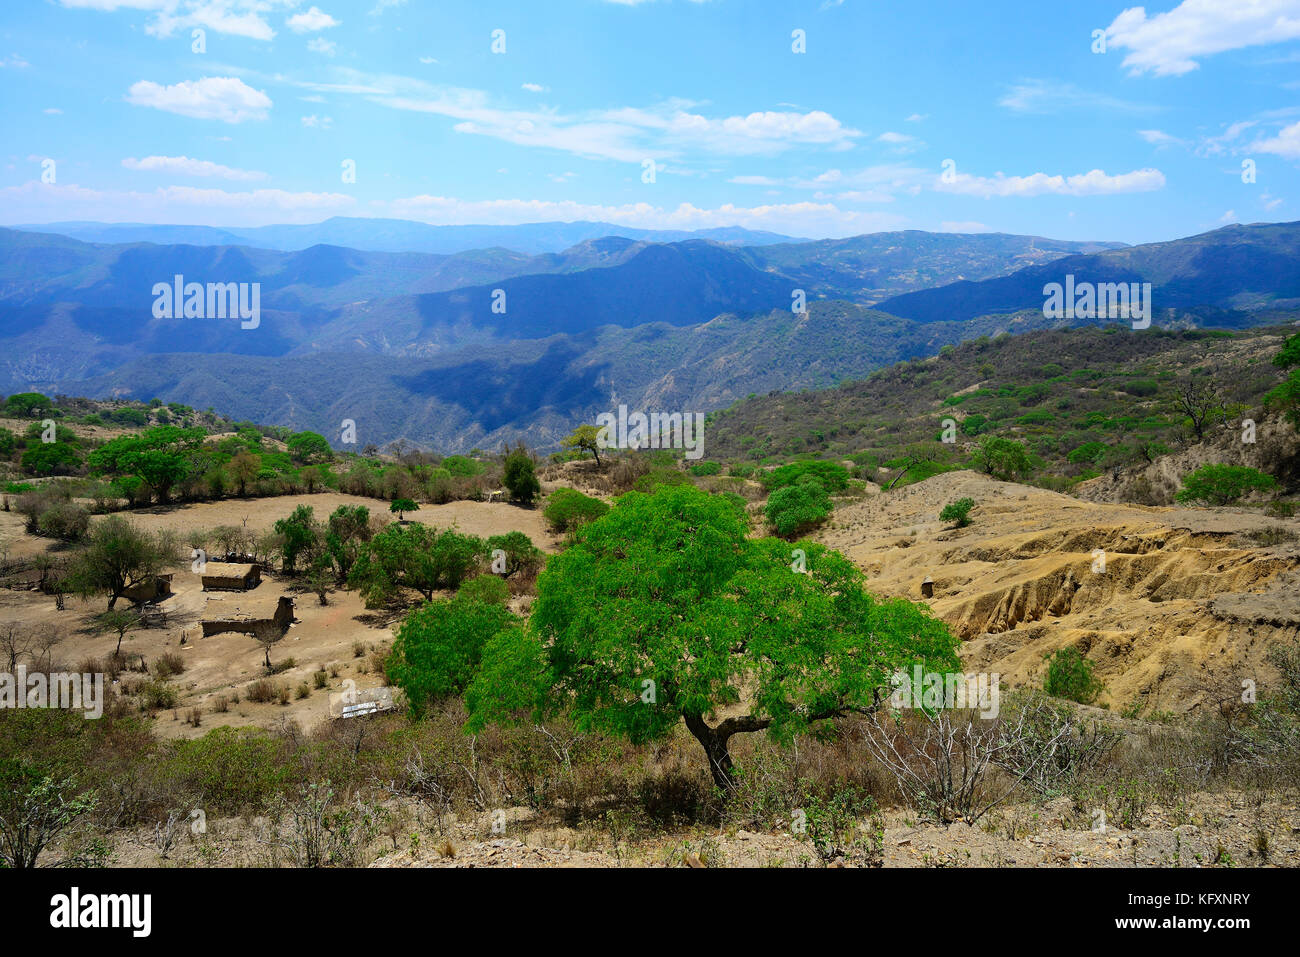 Ruta del che, Cordillera Oriental, in der Nähe von La Higuera, Santa Cruz, Bolivien Stockbild